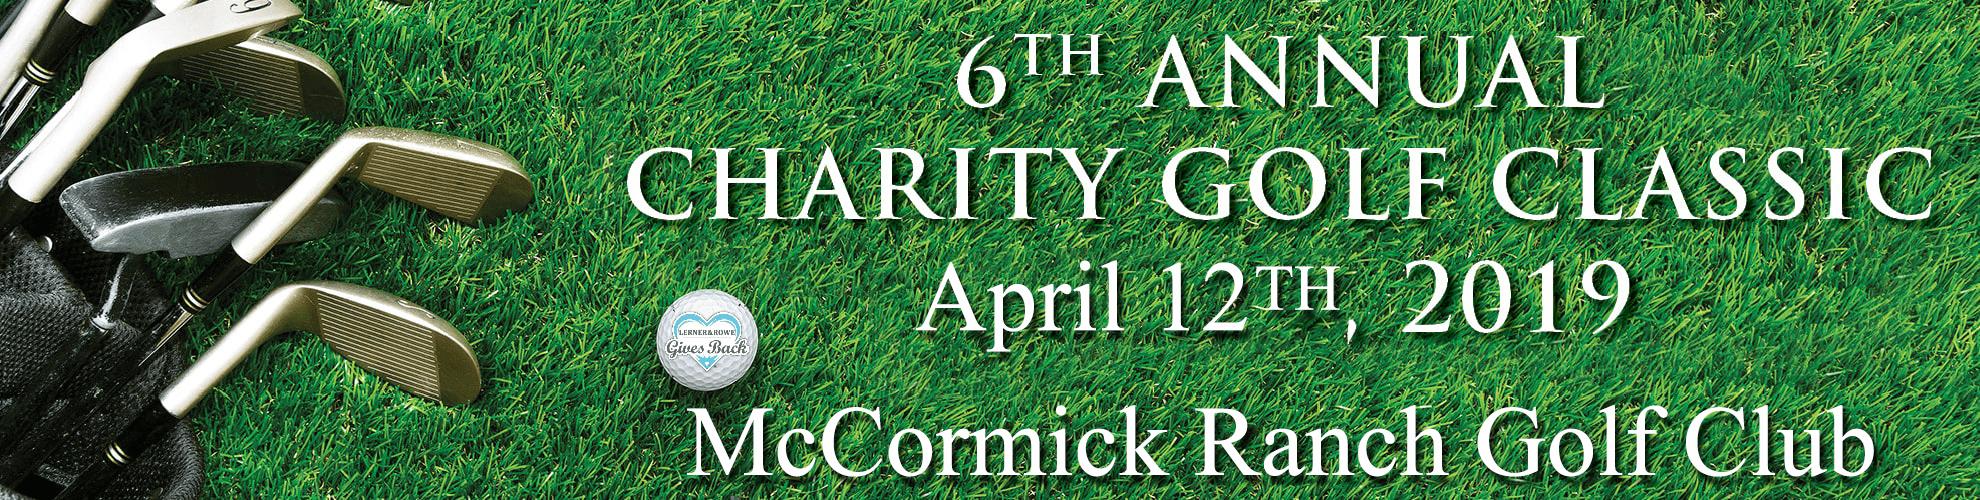 LRGB 6th Annual Charity Golf Classic